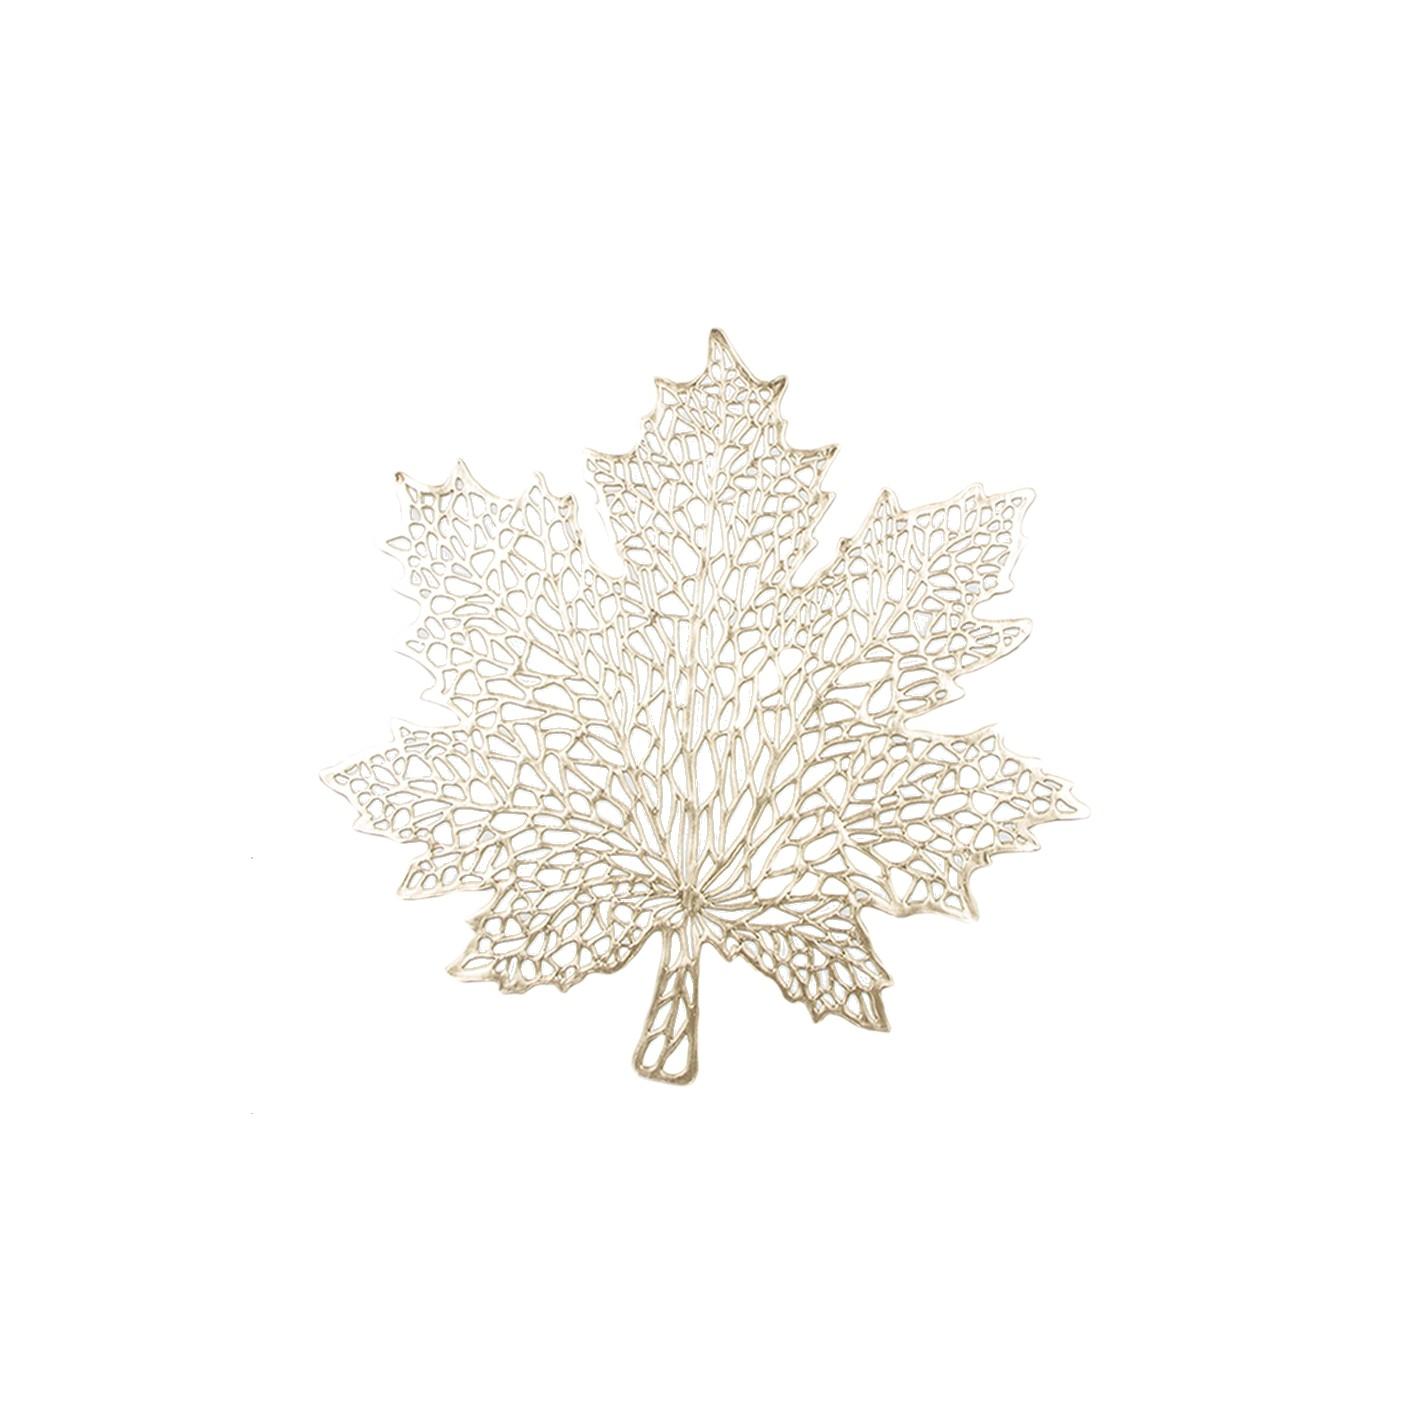 Pano Americano Retangular 42 x 33 cm PVC Ouro - Bianchini